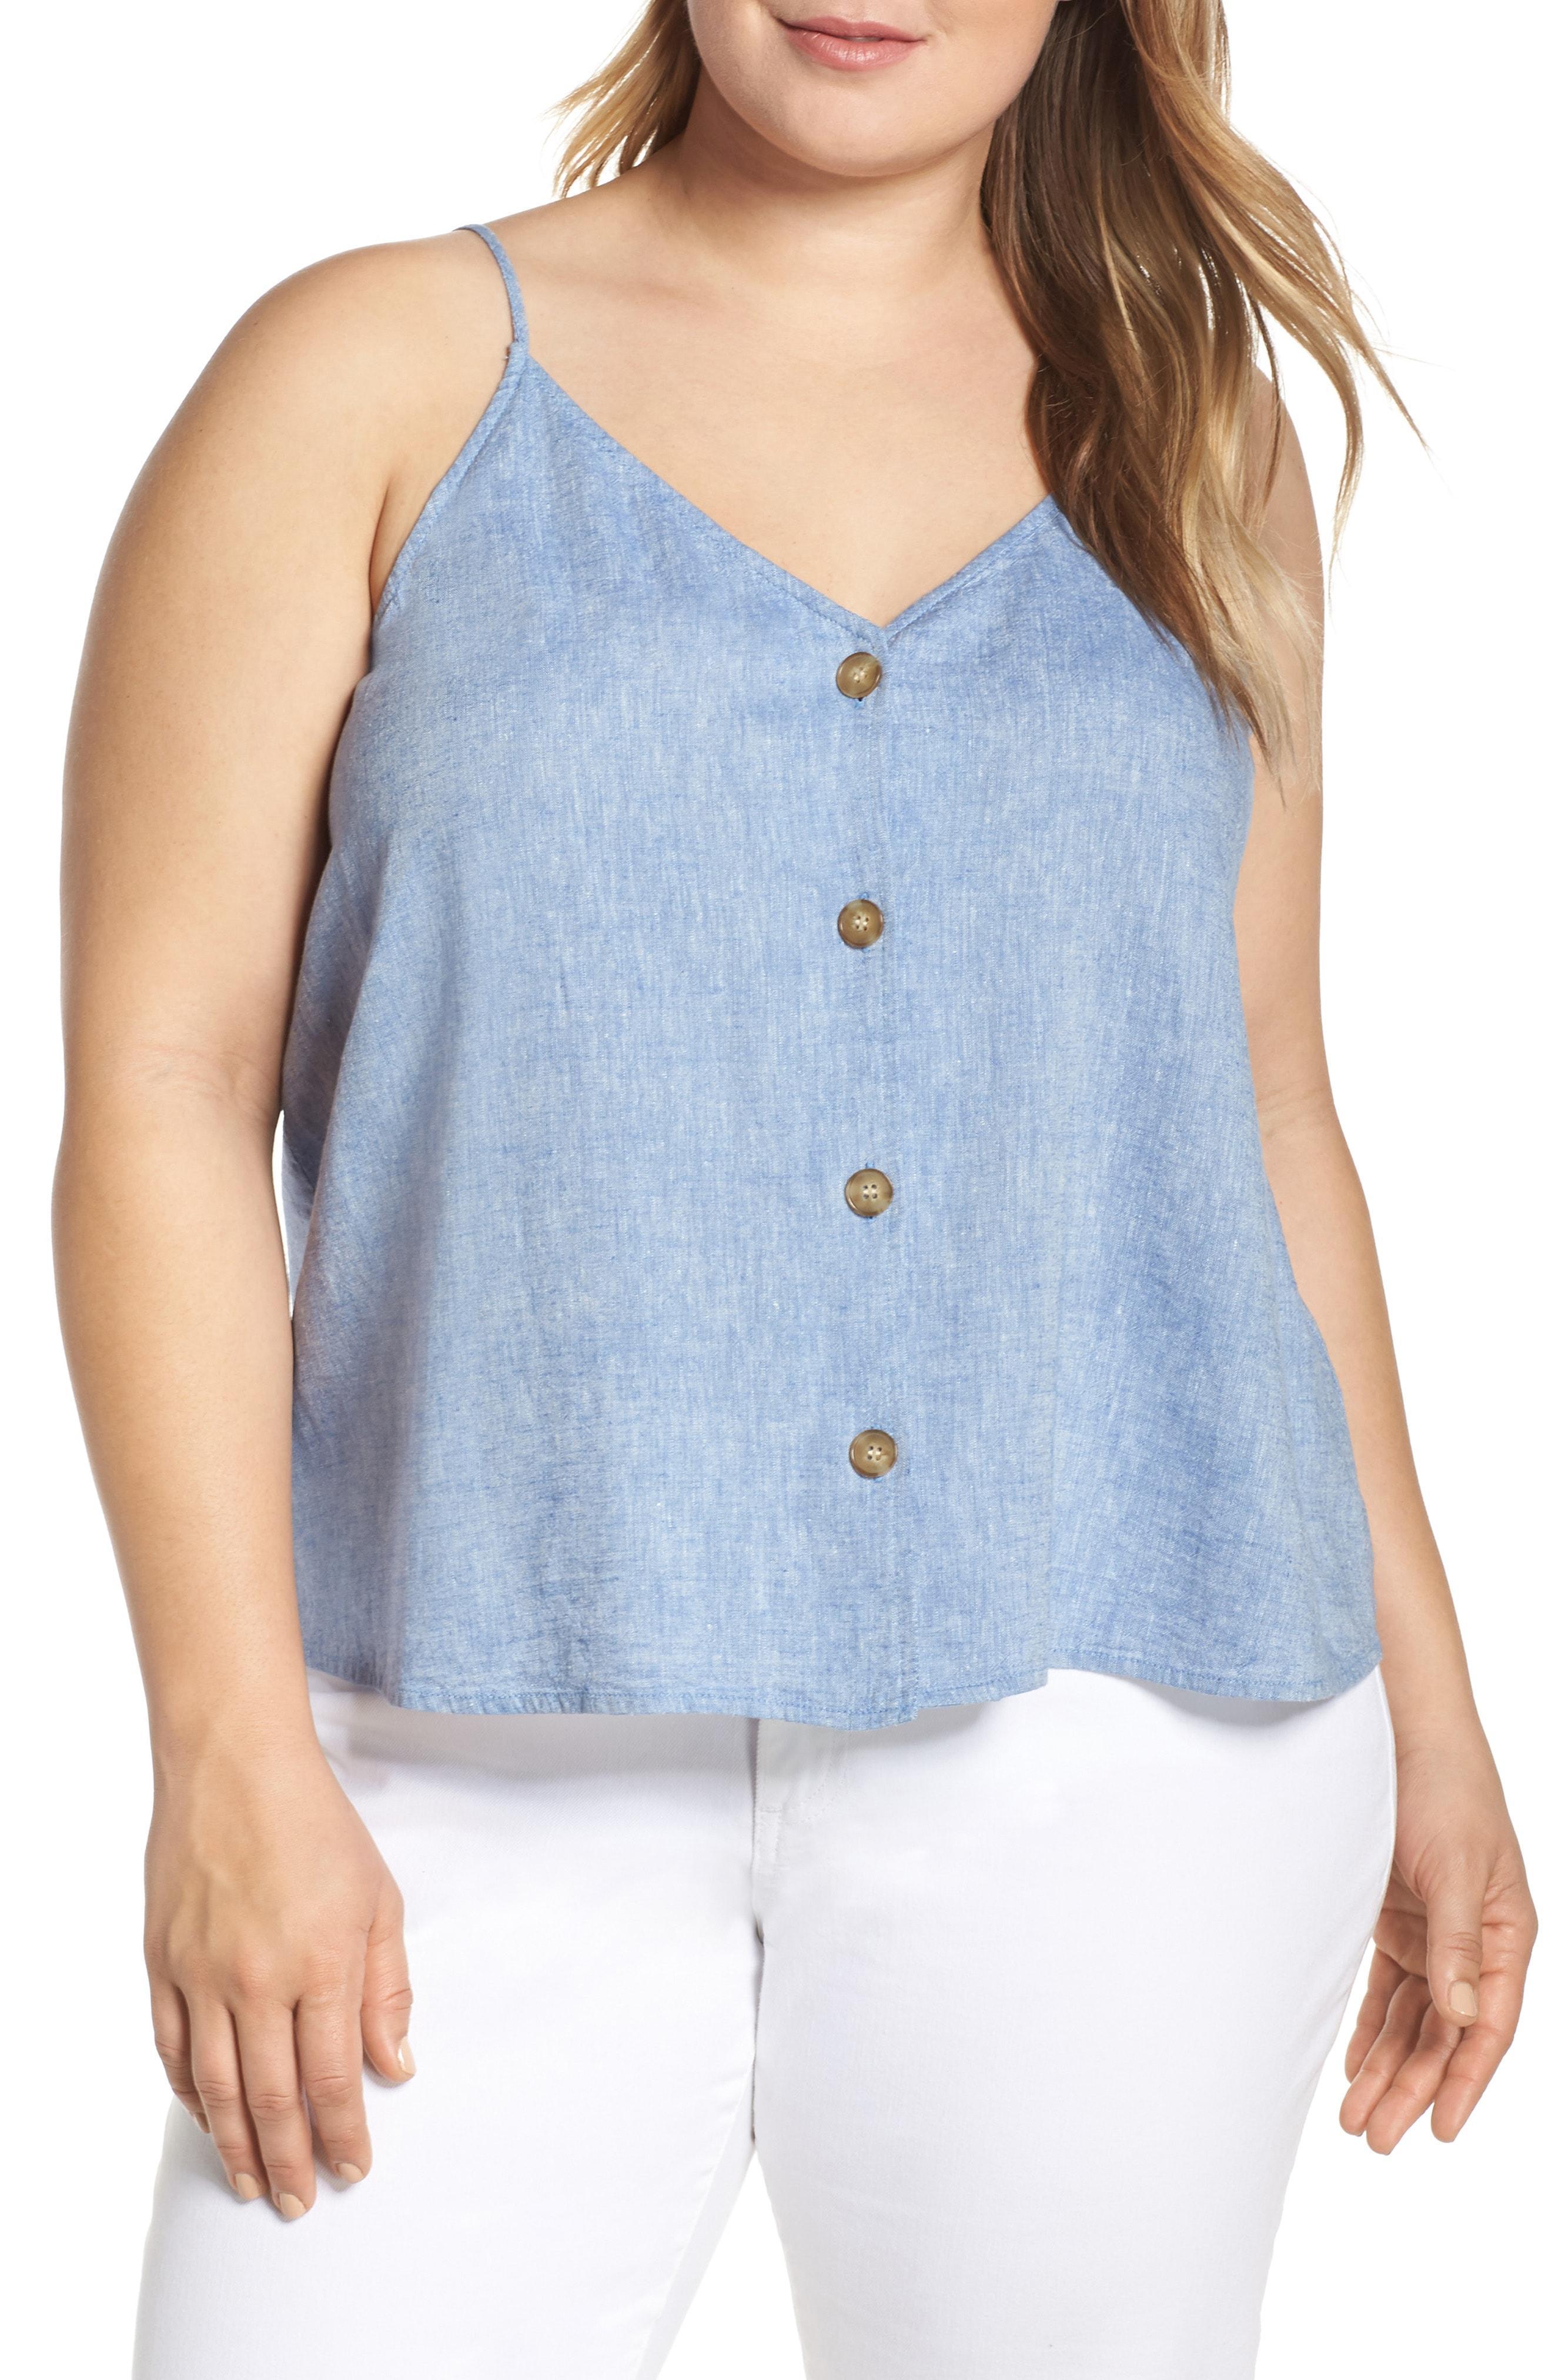 563e22ac8 Lyst - BP. Button Front Linen Blend Camisole Top in Blue